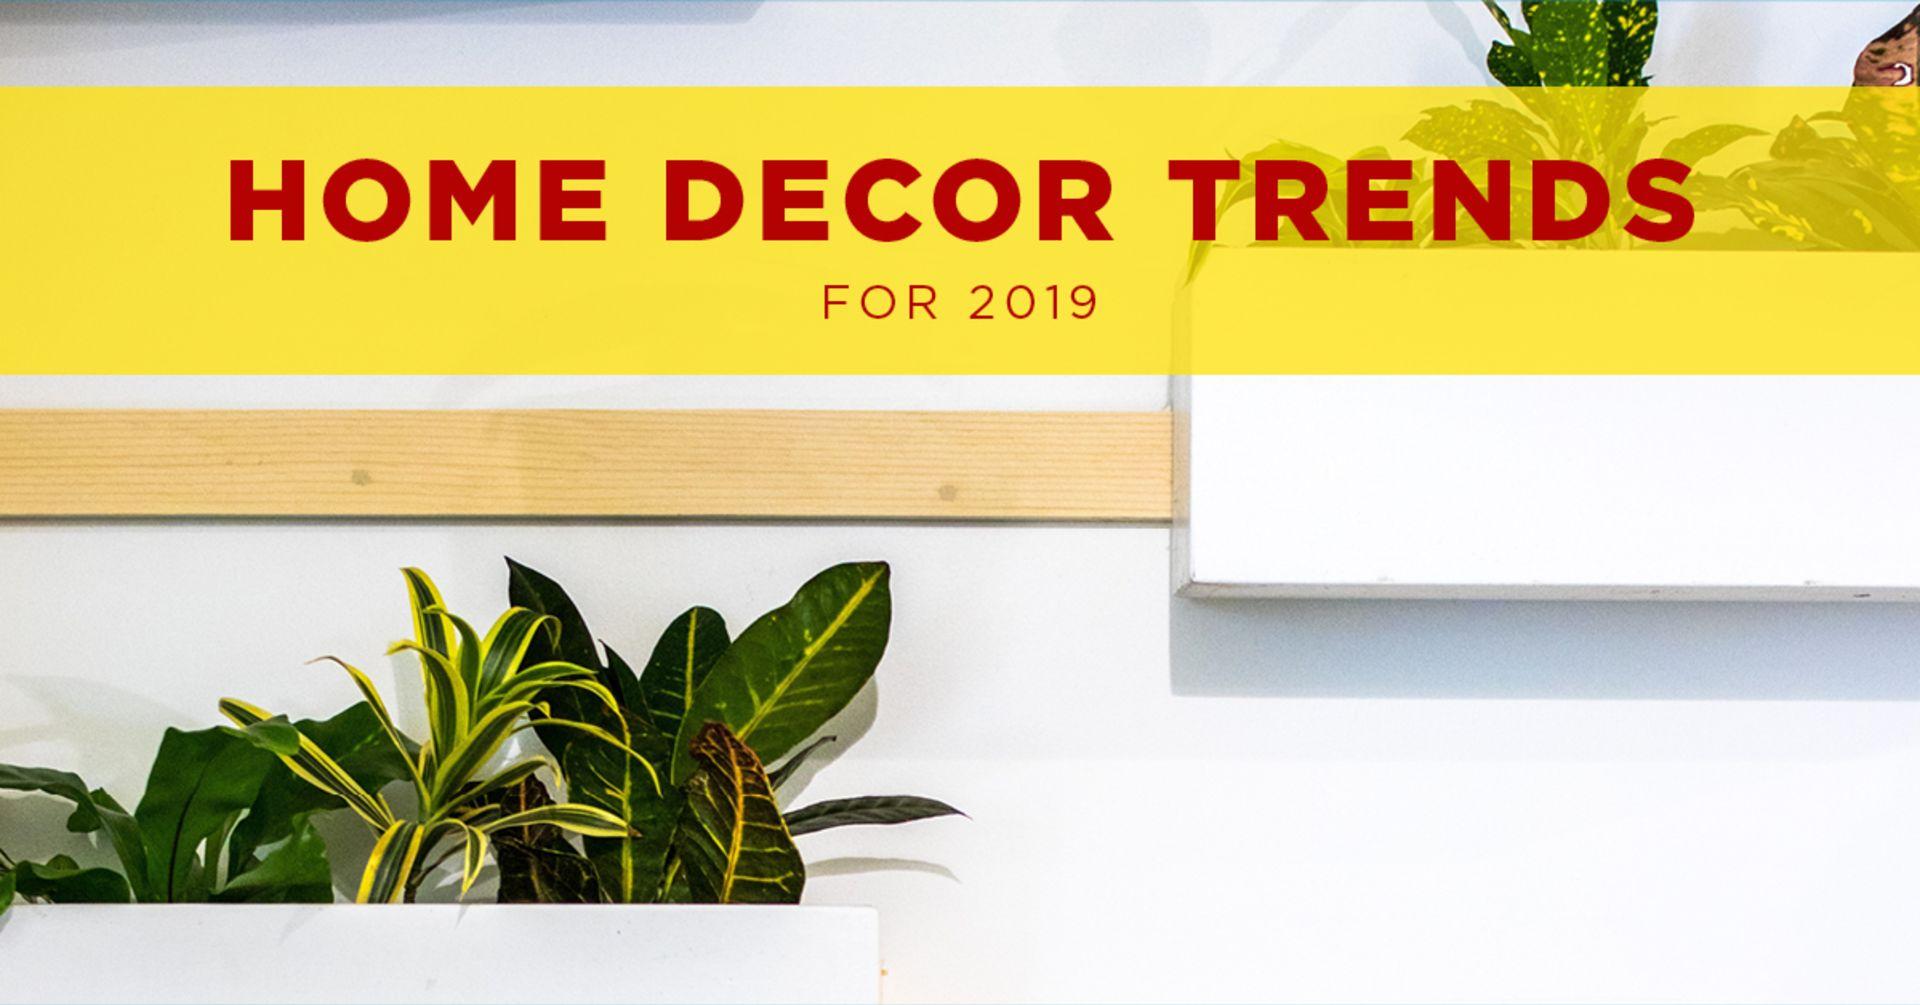 Home Decor Trending in 2019